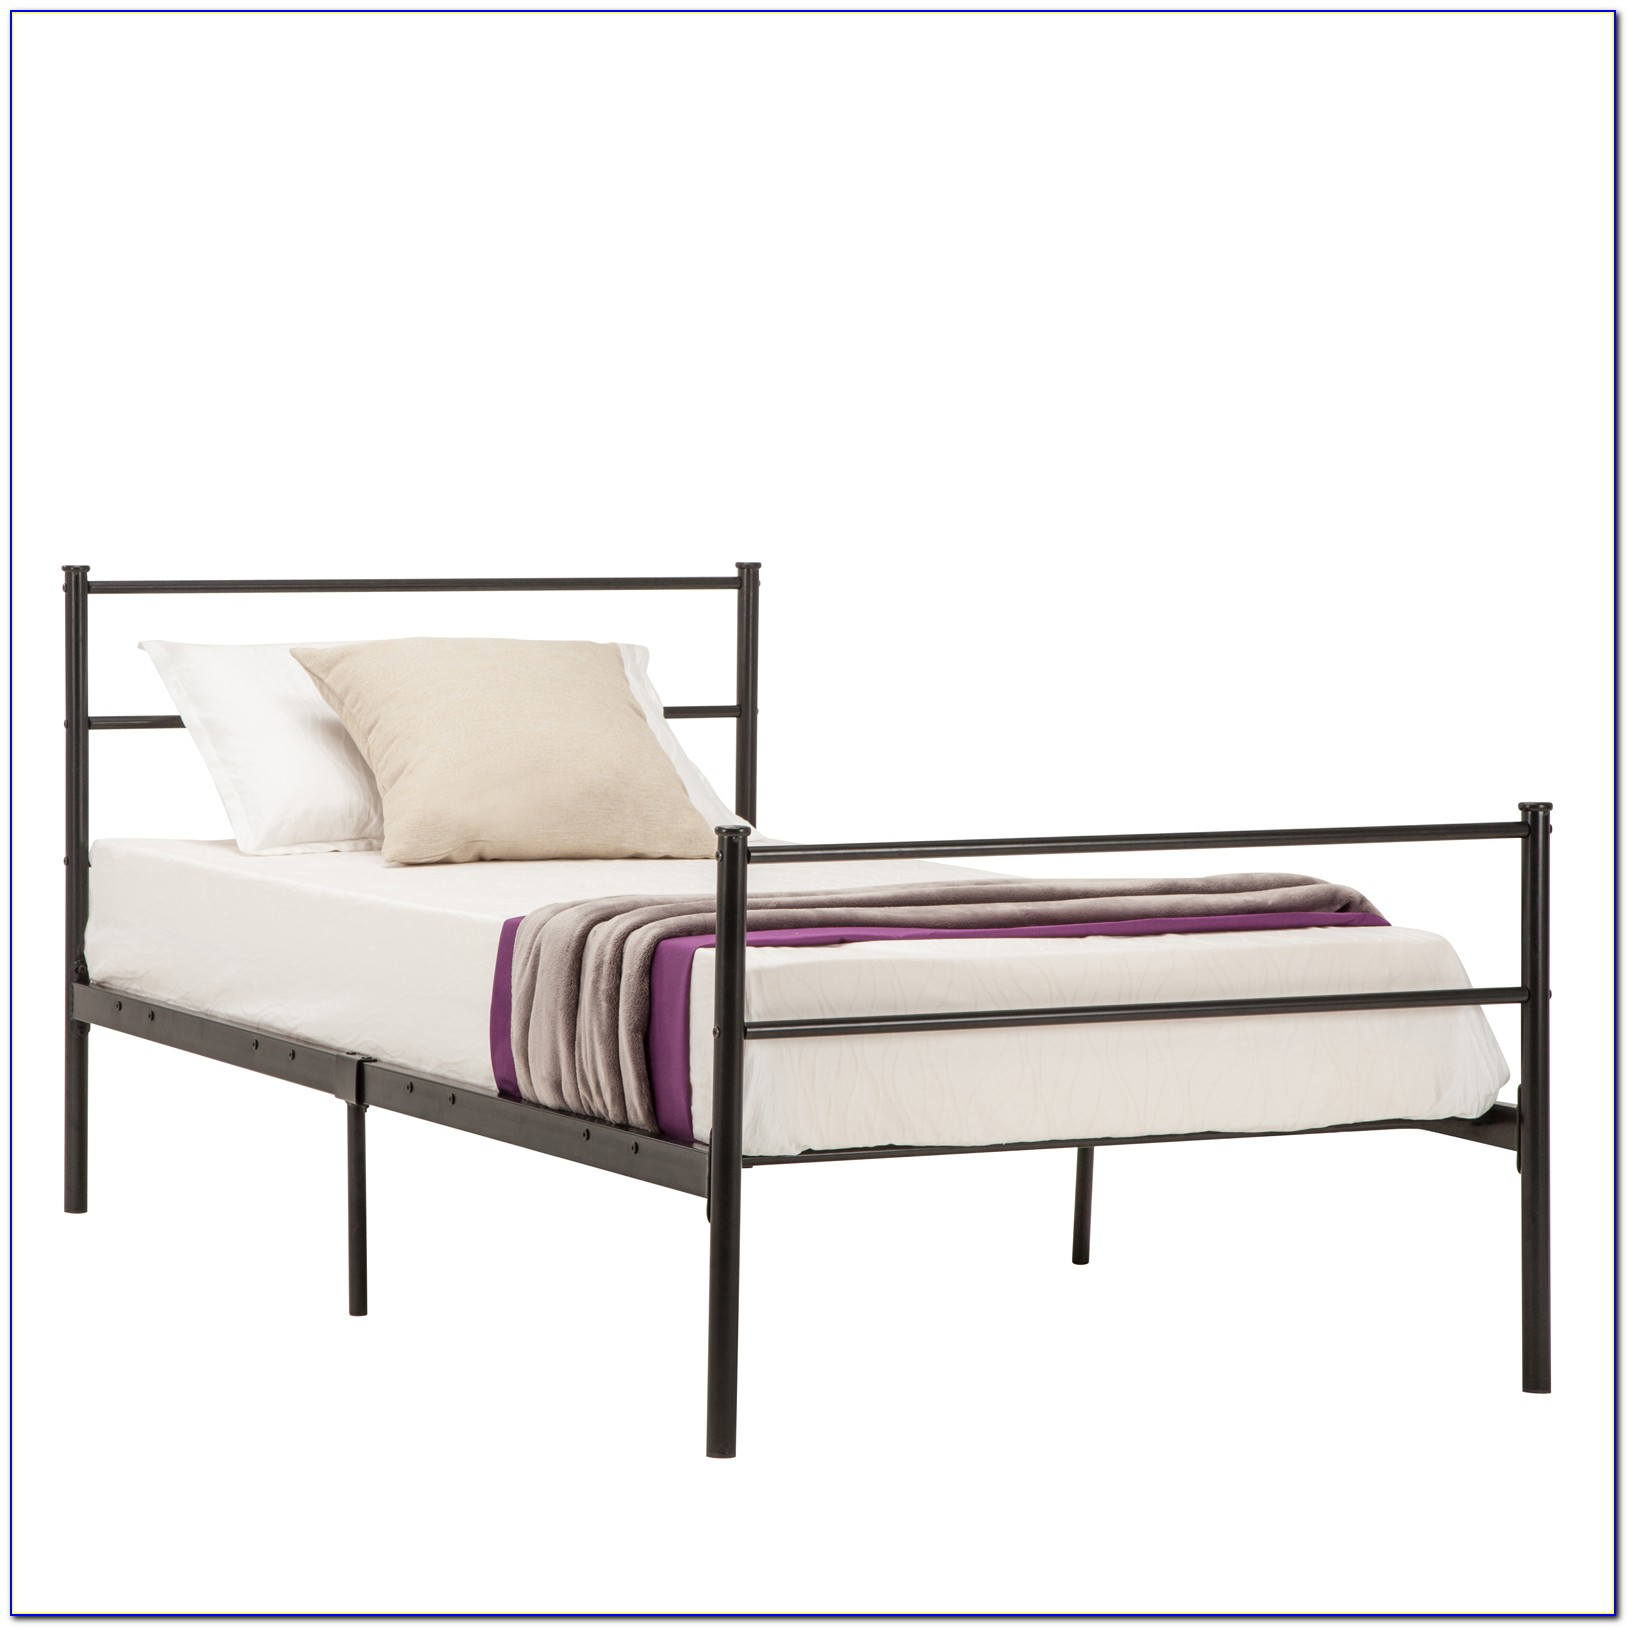 Twin Size Metal Bed Headboard & Footboard